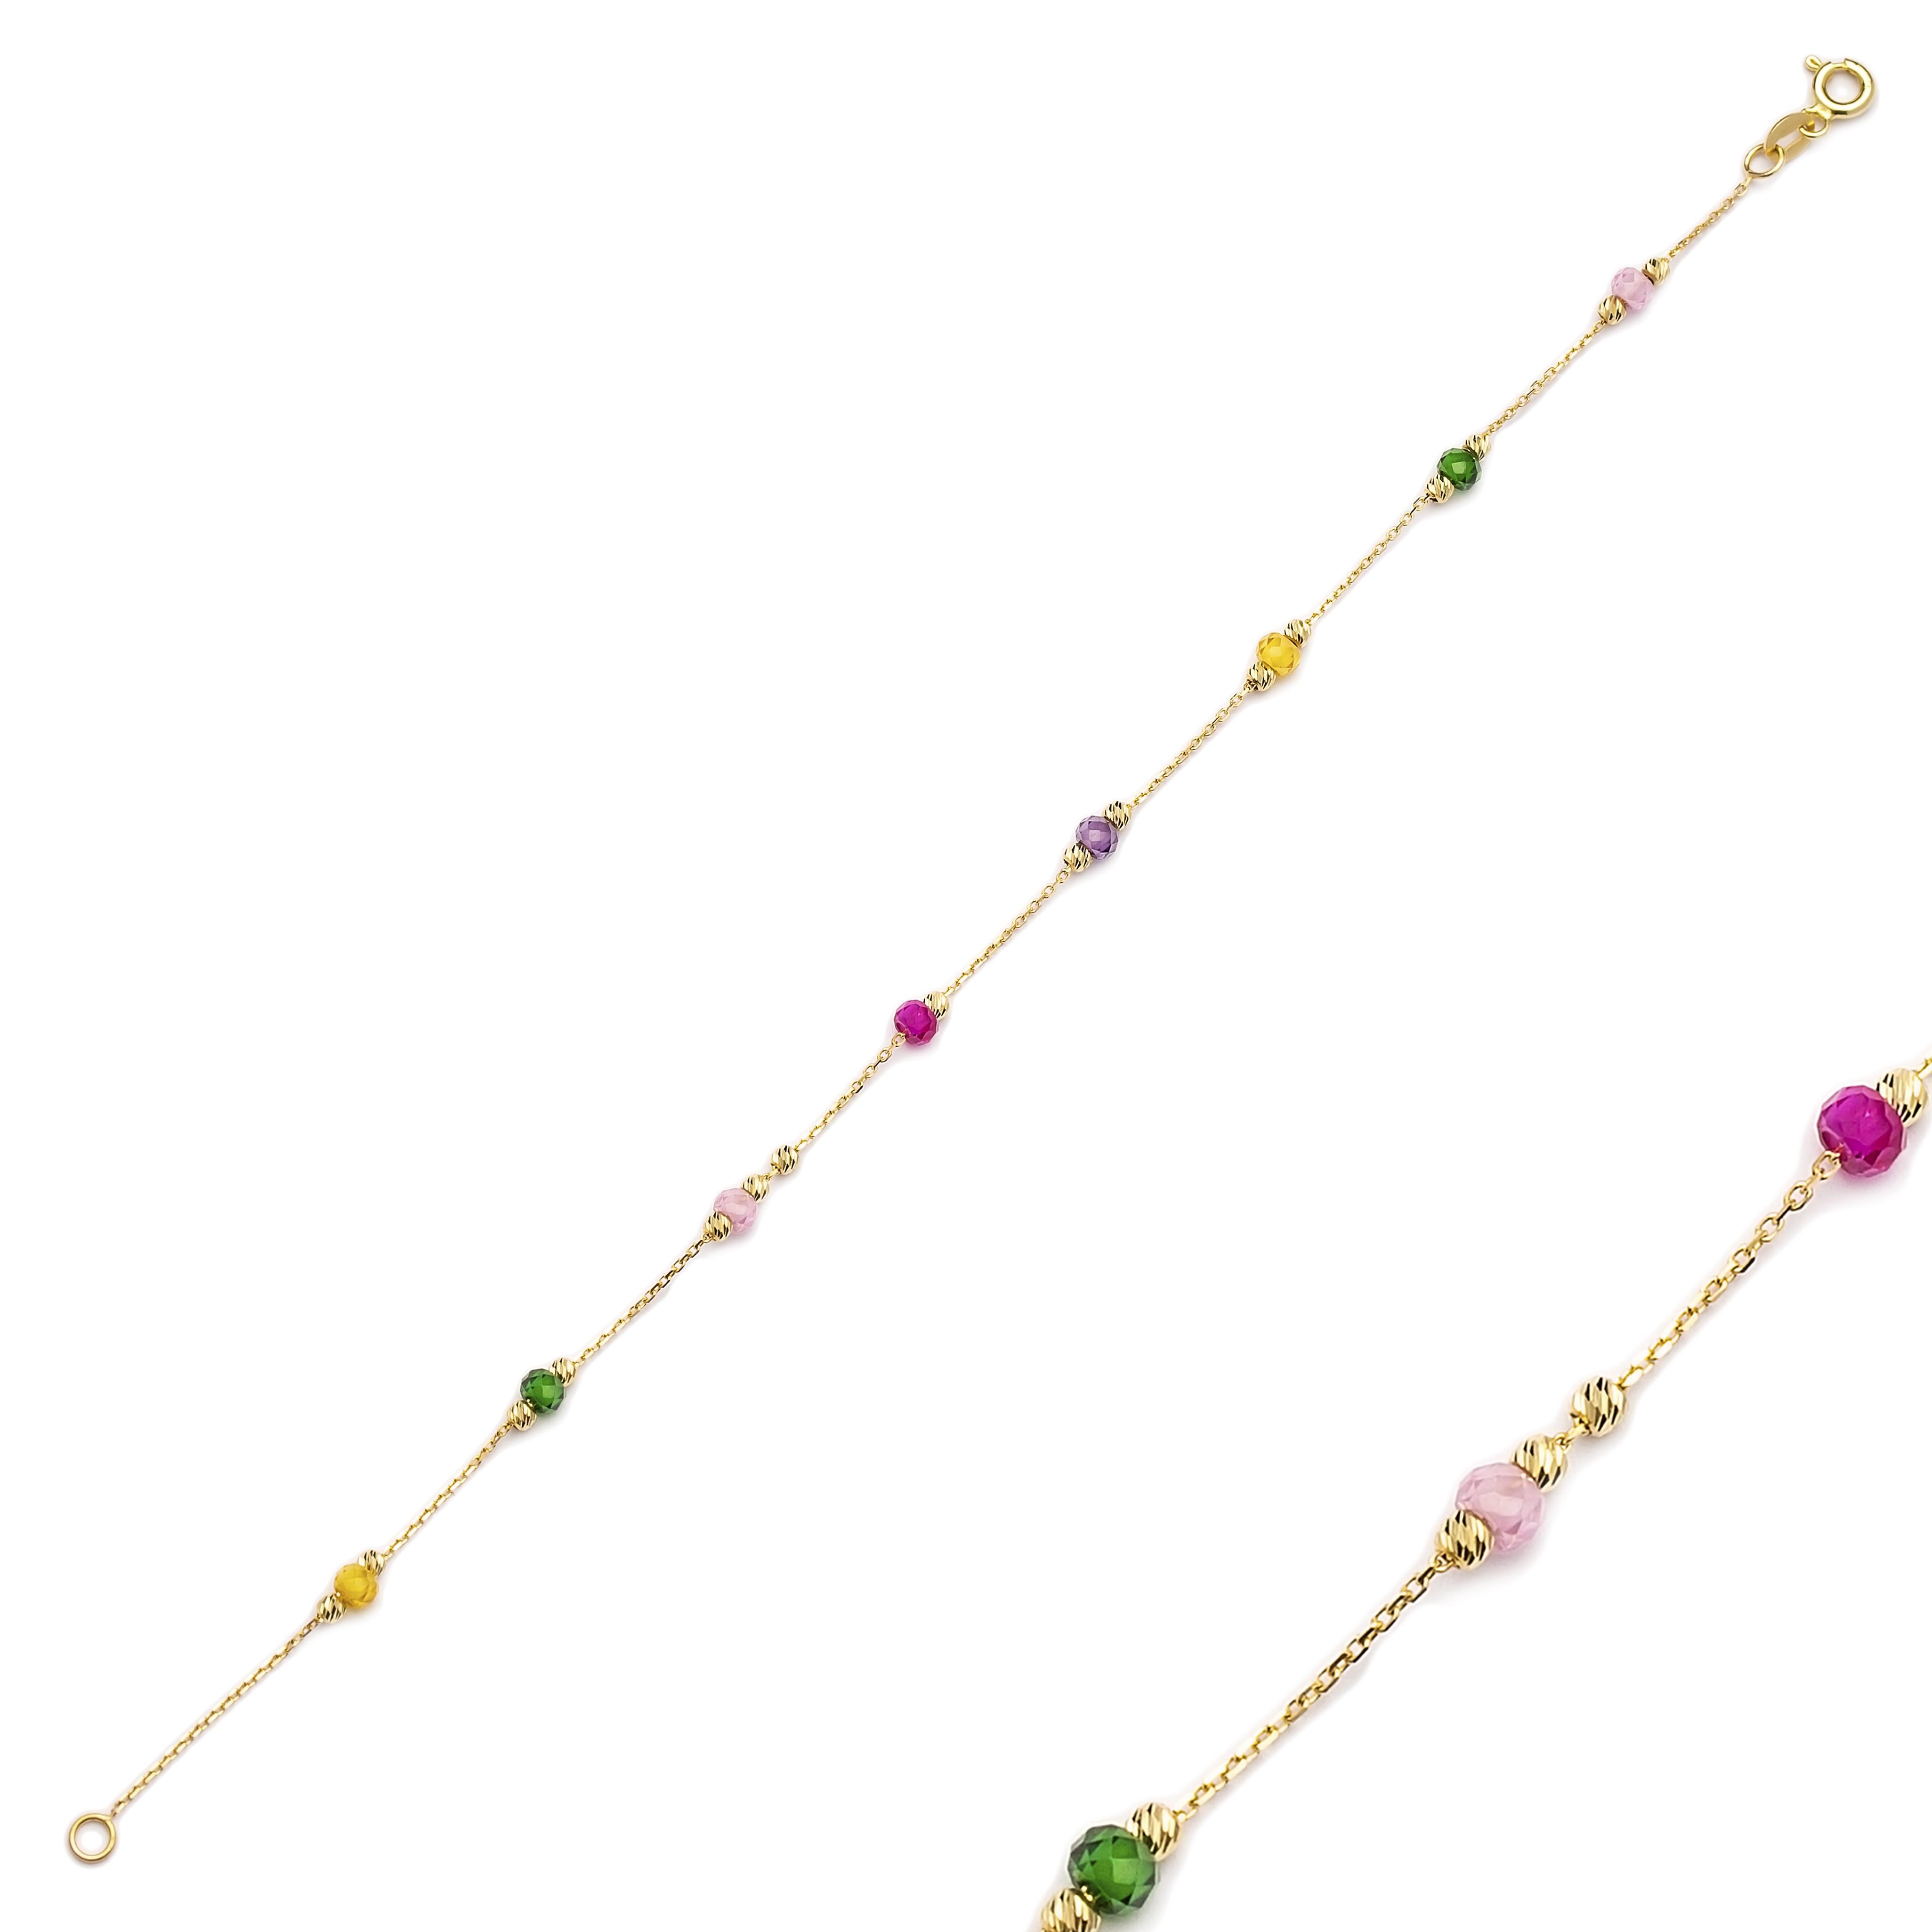 Dainty Elegant Colorful Turkish Wholesale 14k Gold Bracelet